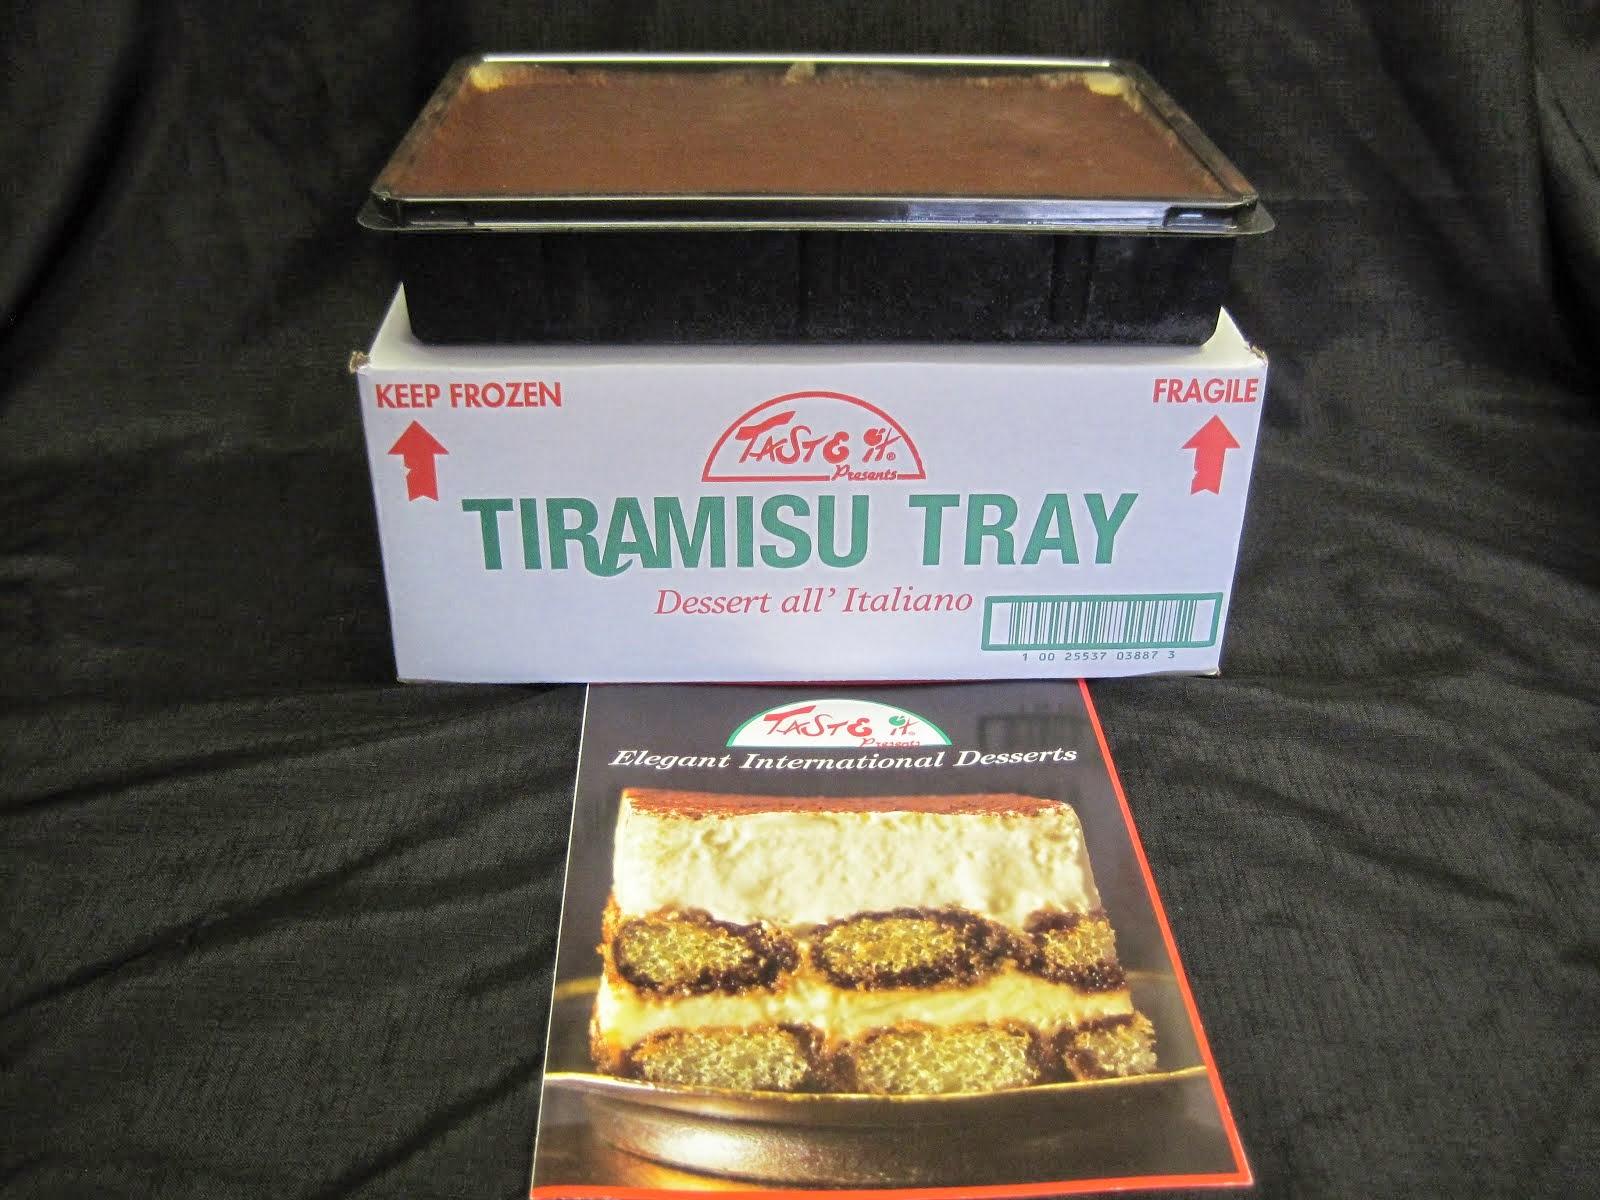 Tiramisu Dessert - item # 28200 and 28201 for single tray